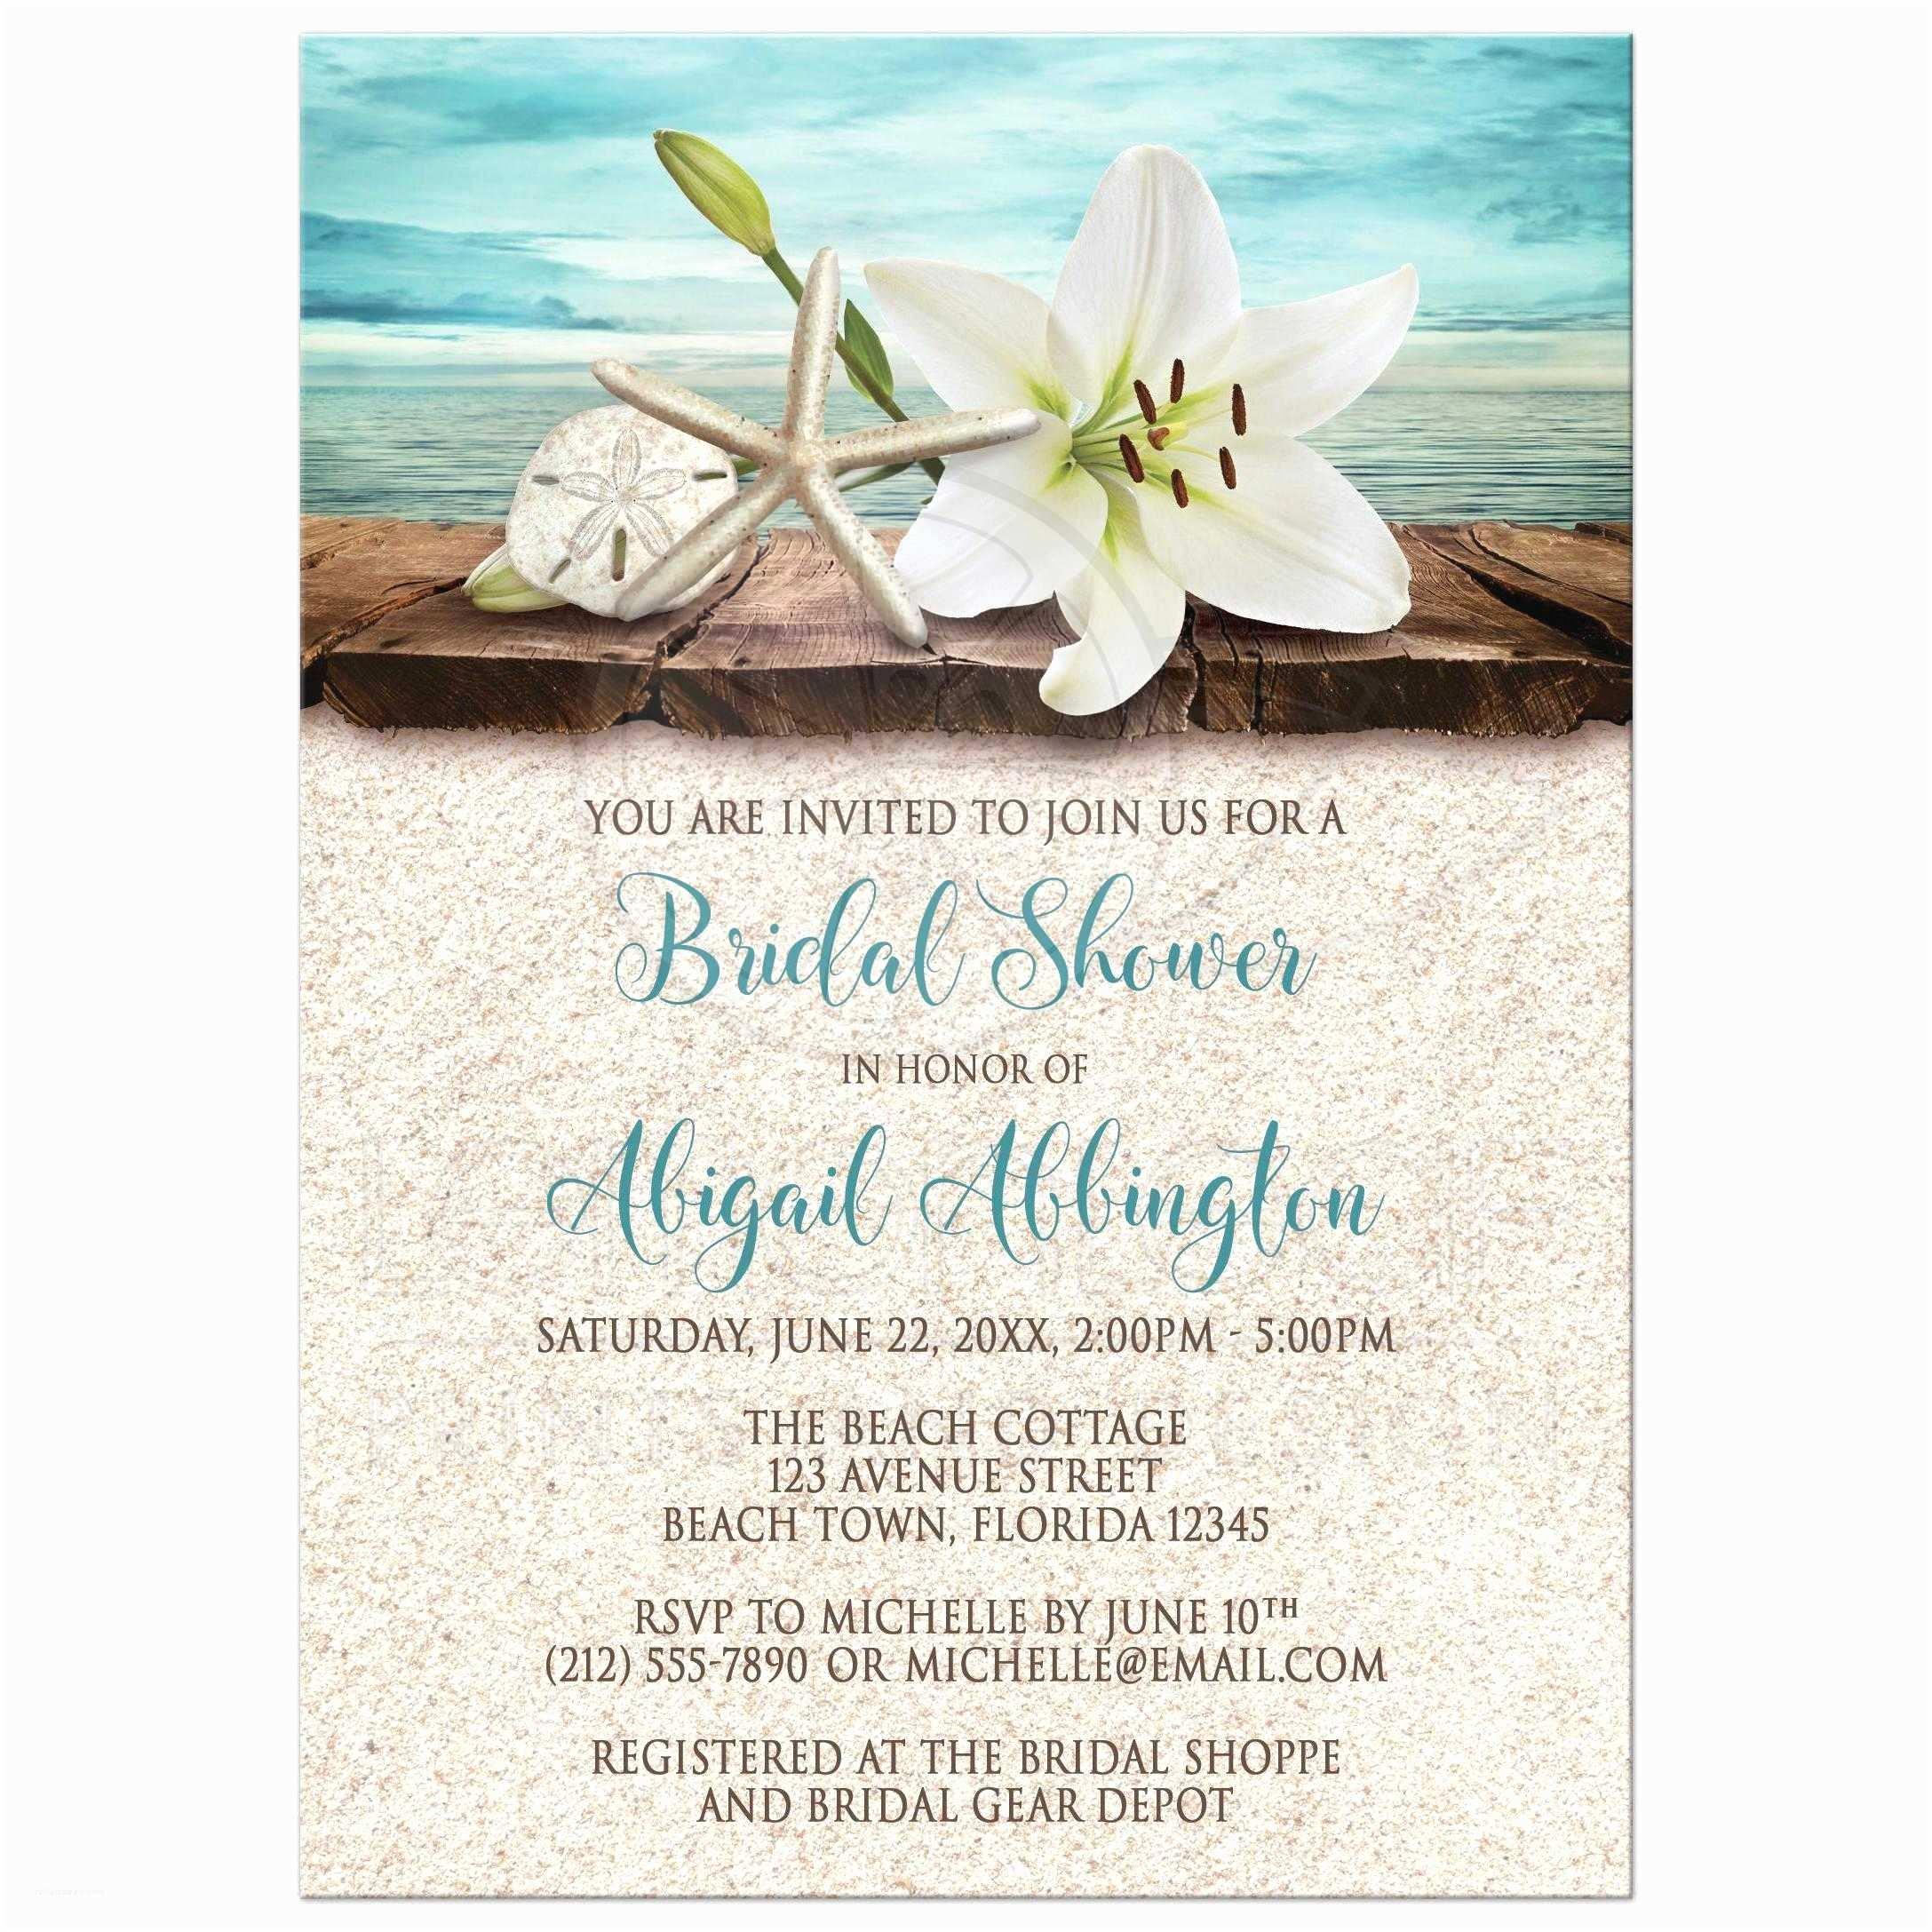 Seashell Wedding Invitations Bridal Shower Invitations Beach Lily Seashells and Sand